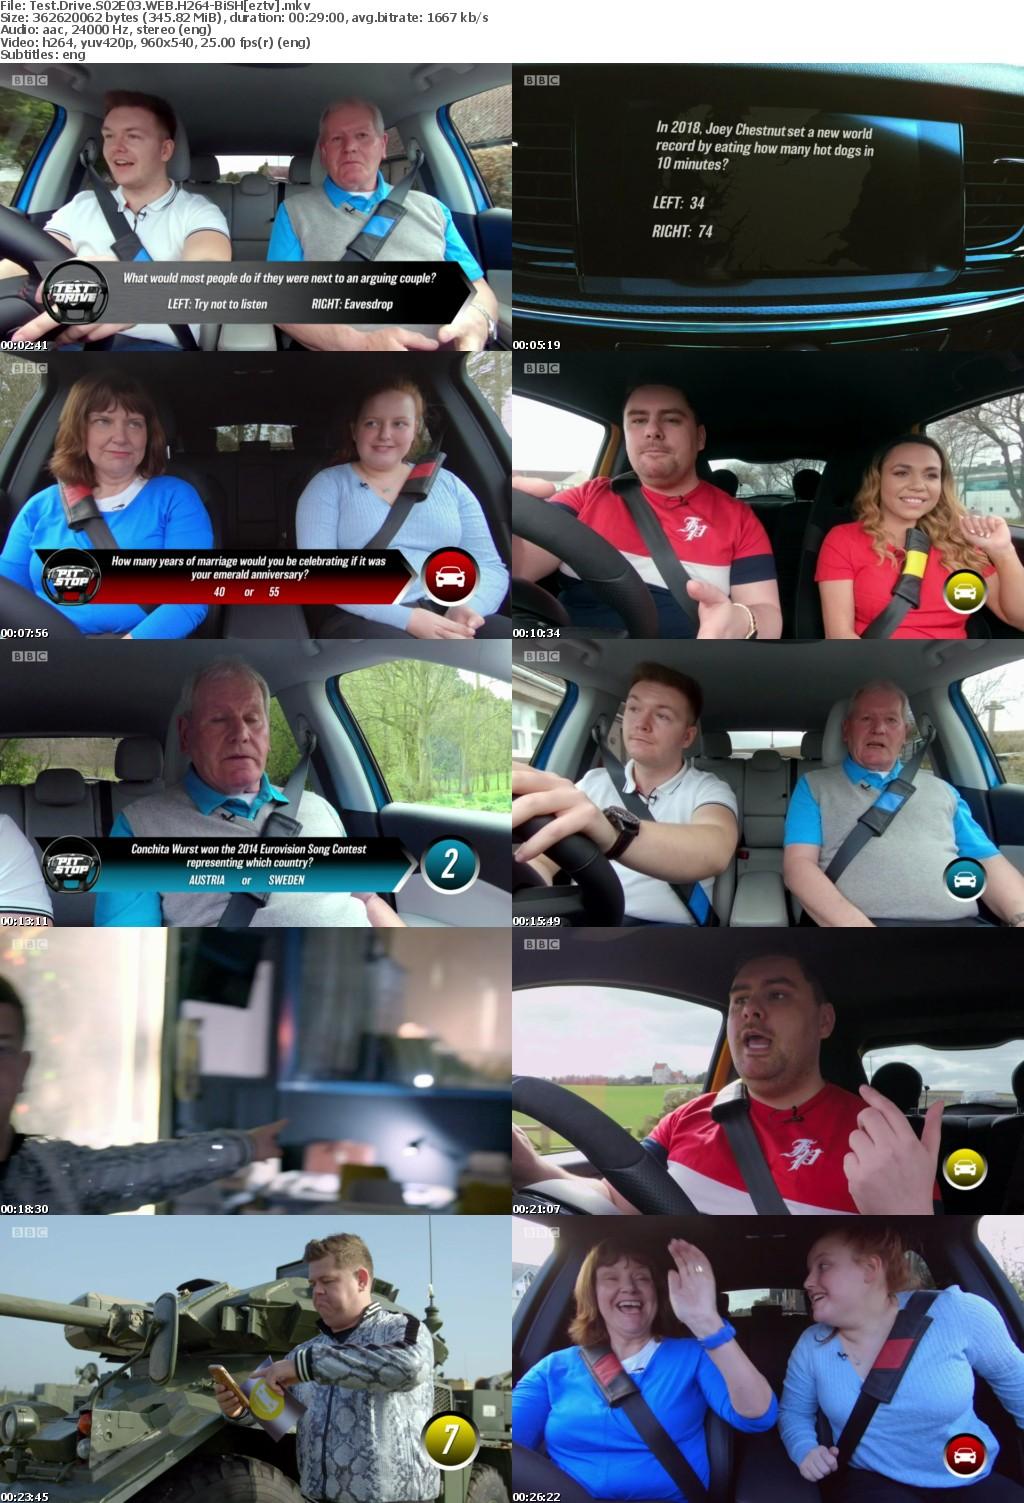 Test Drive S02E03 WEB H264-BiSH